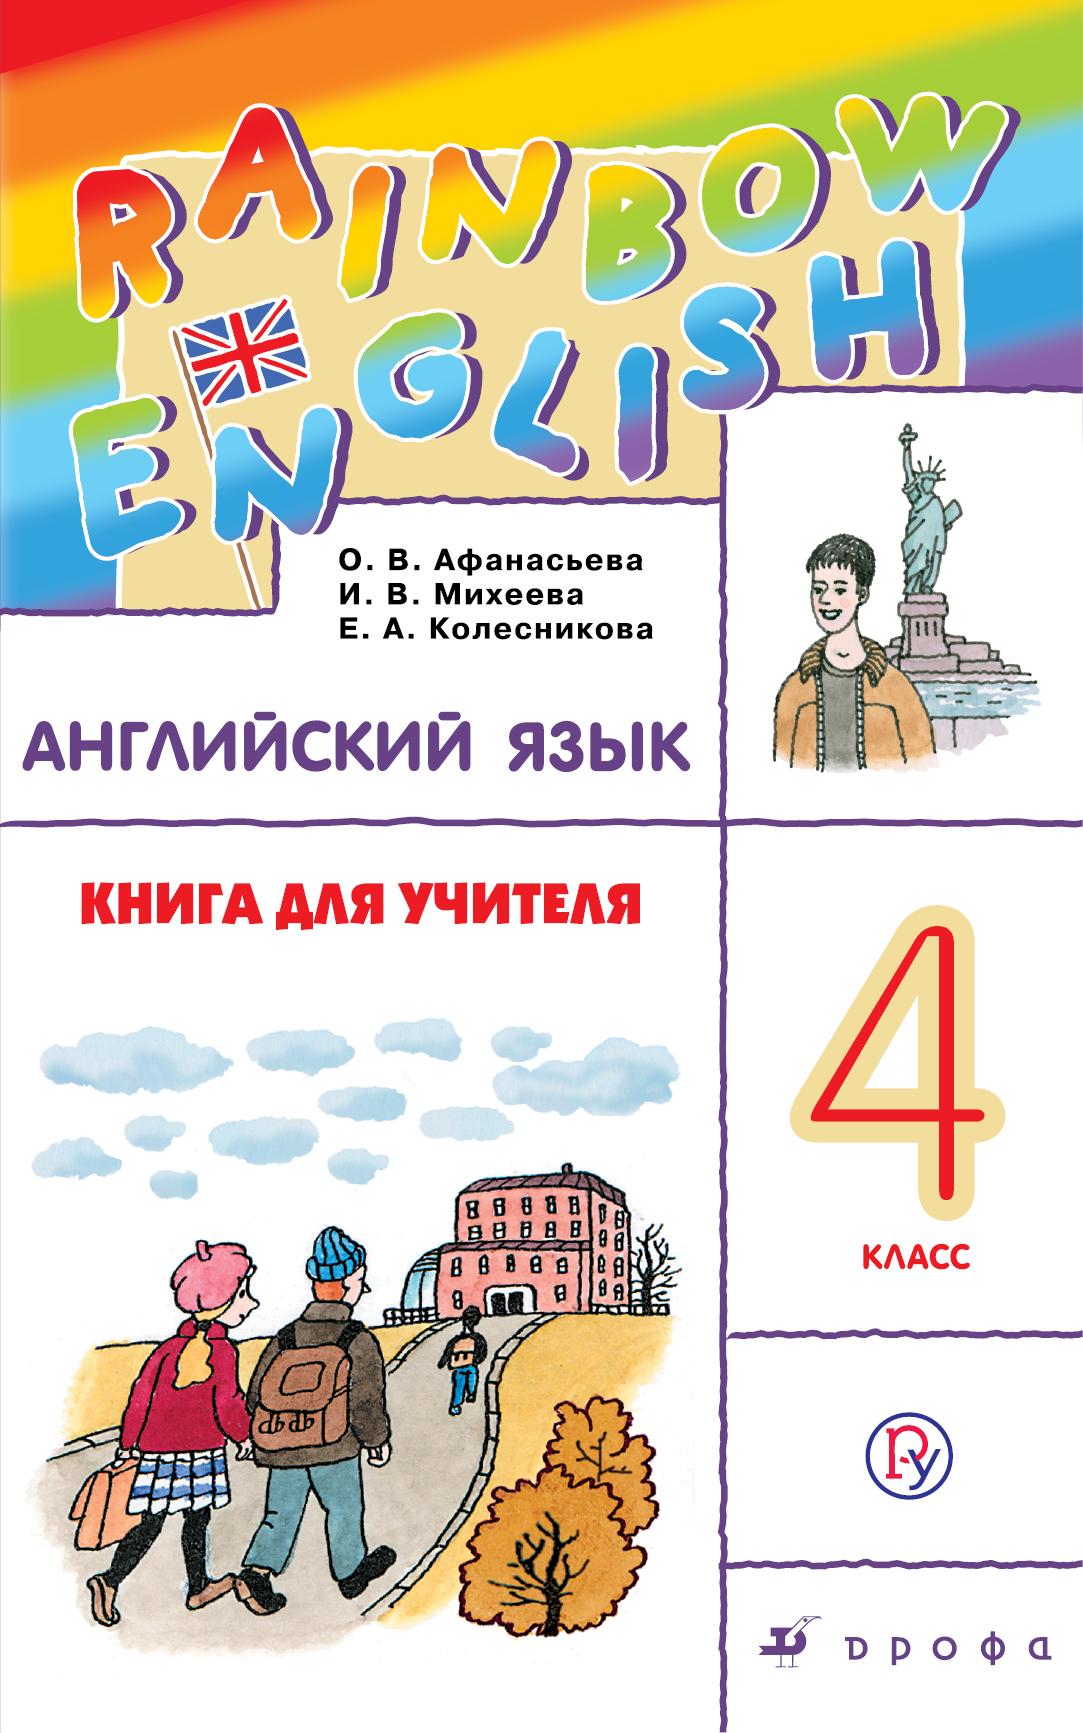 Английский язык. 4 класс. Книга для учителя ( Афанасьева О.В., Михеева И.В., Колесникова Е.А.  )